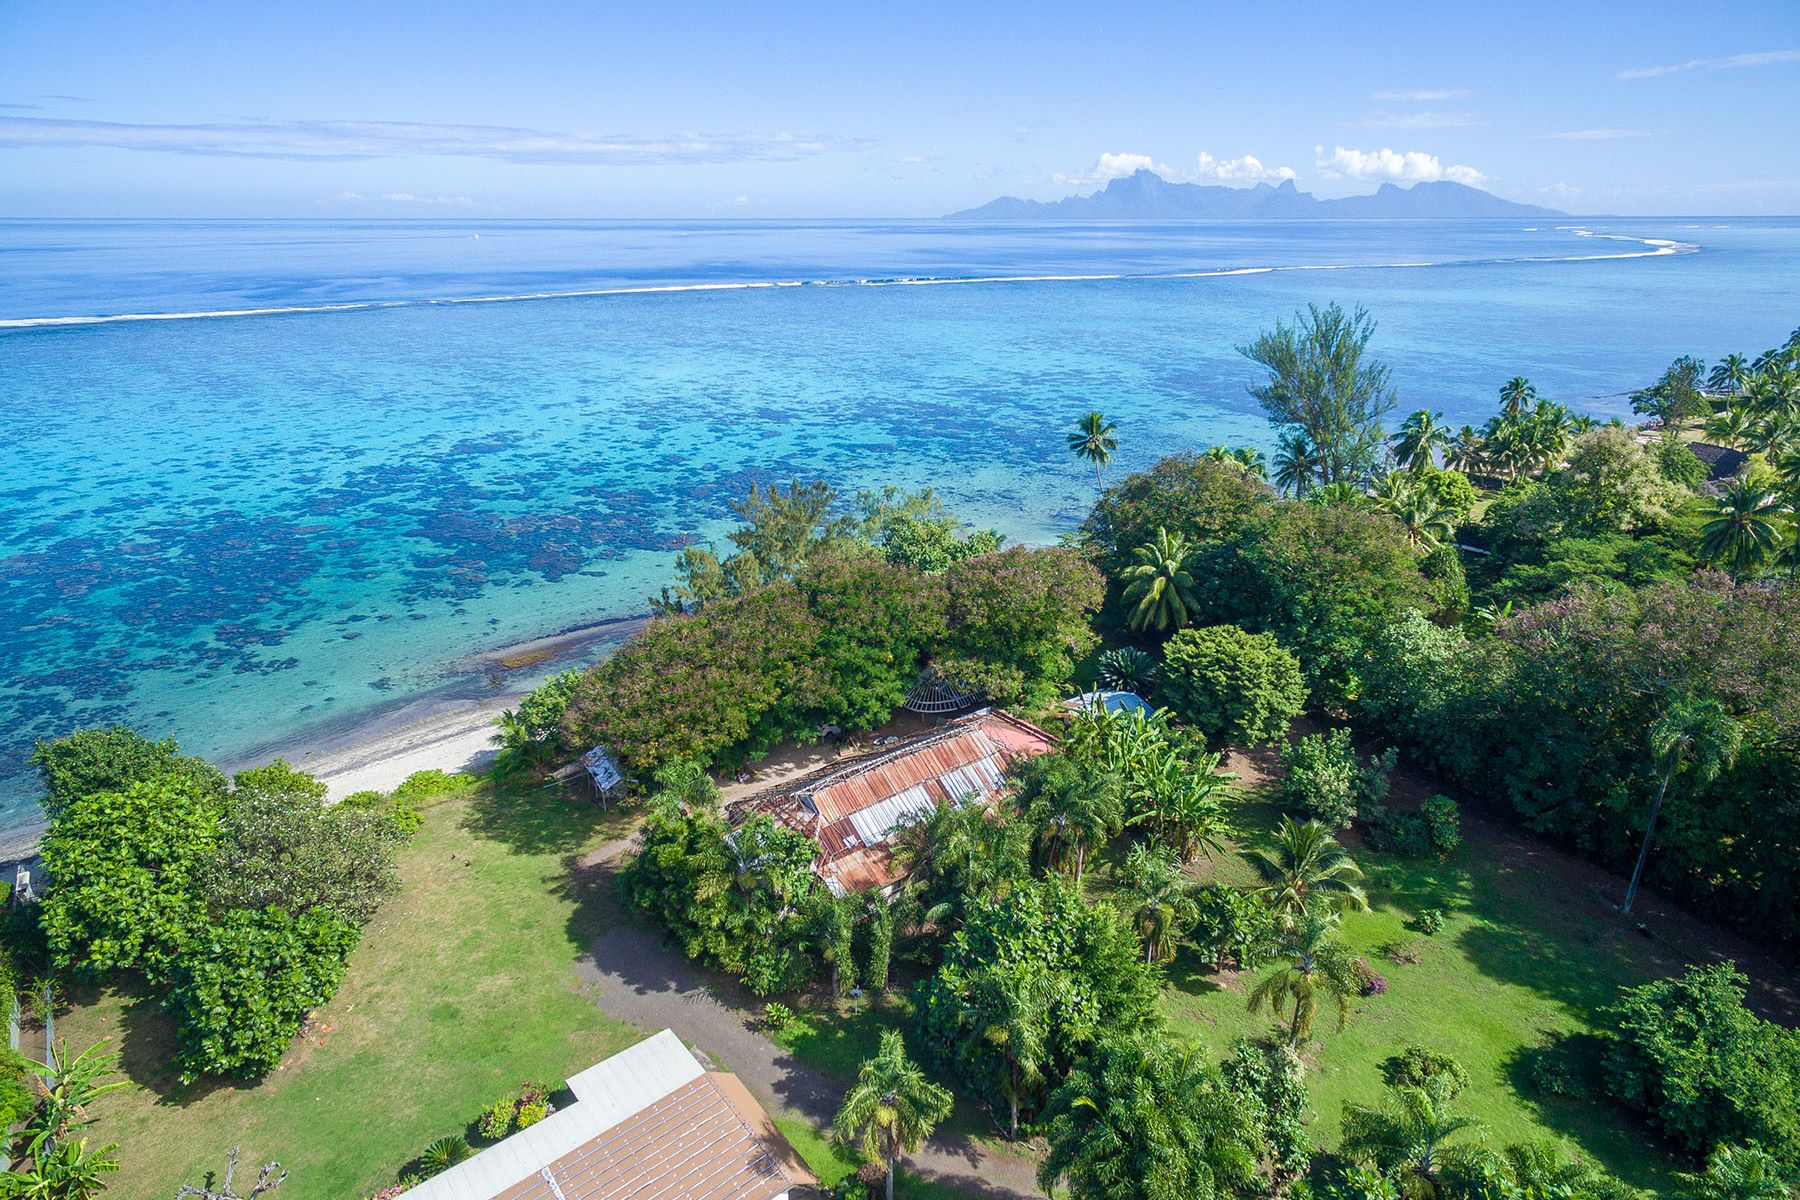 Casa Unifamiliar por un Venta en Facing Moorea on a white sand beach Tahiti, French Polynesia